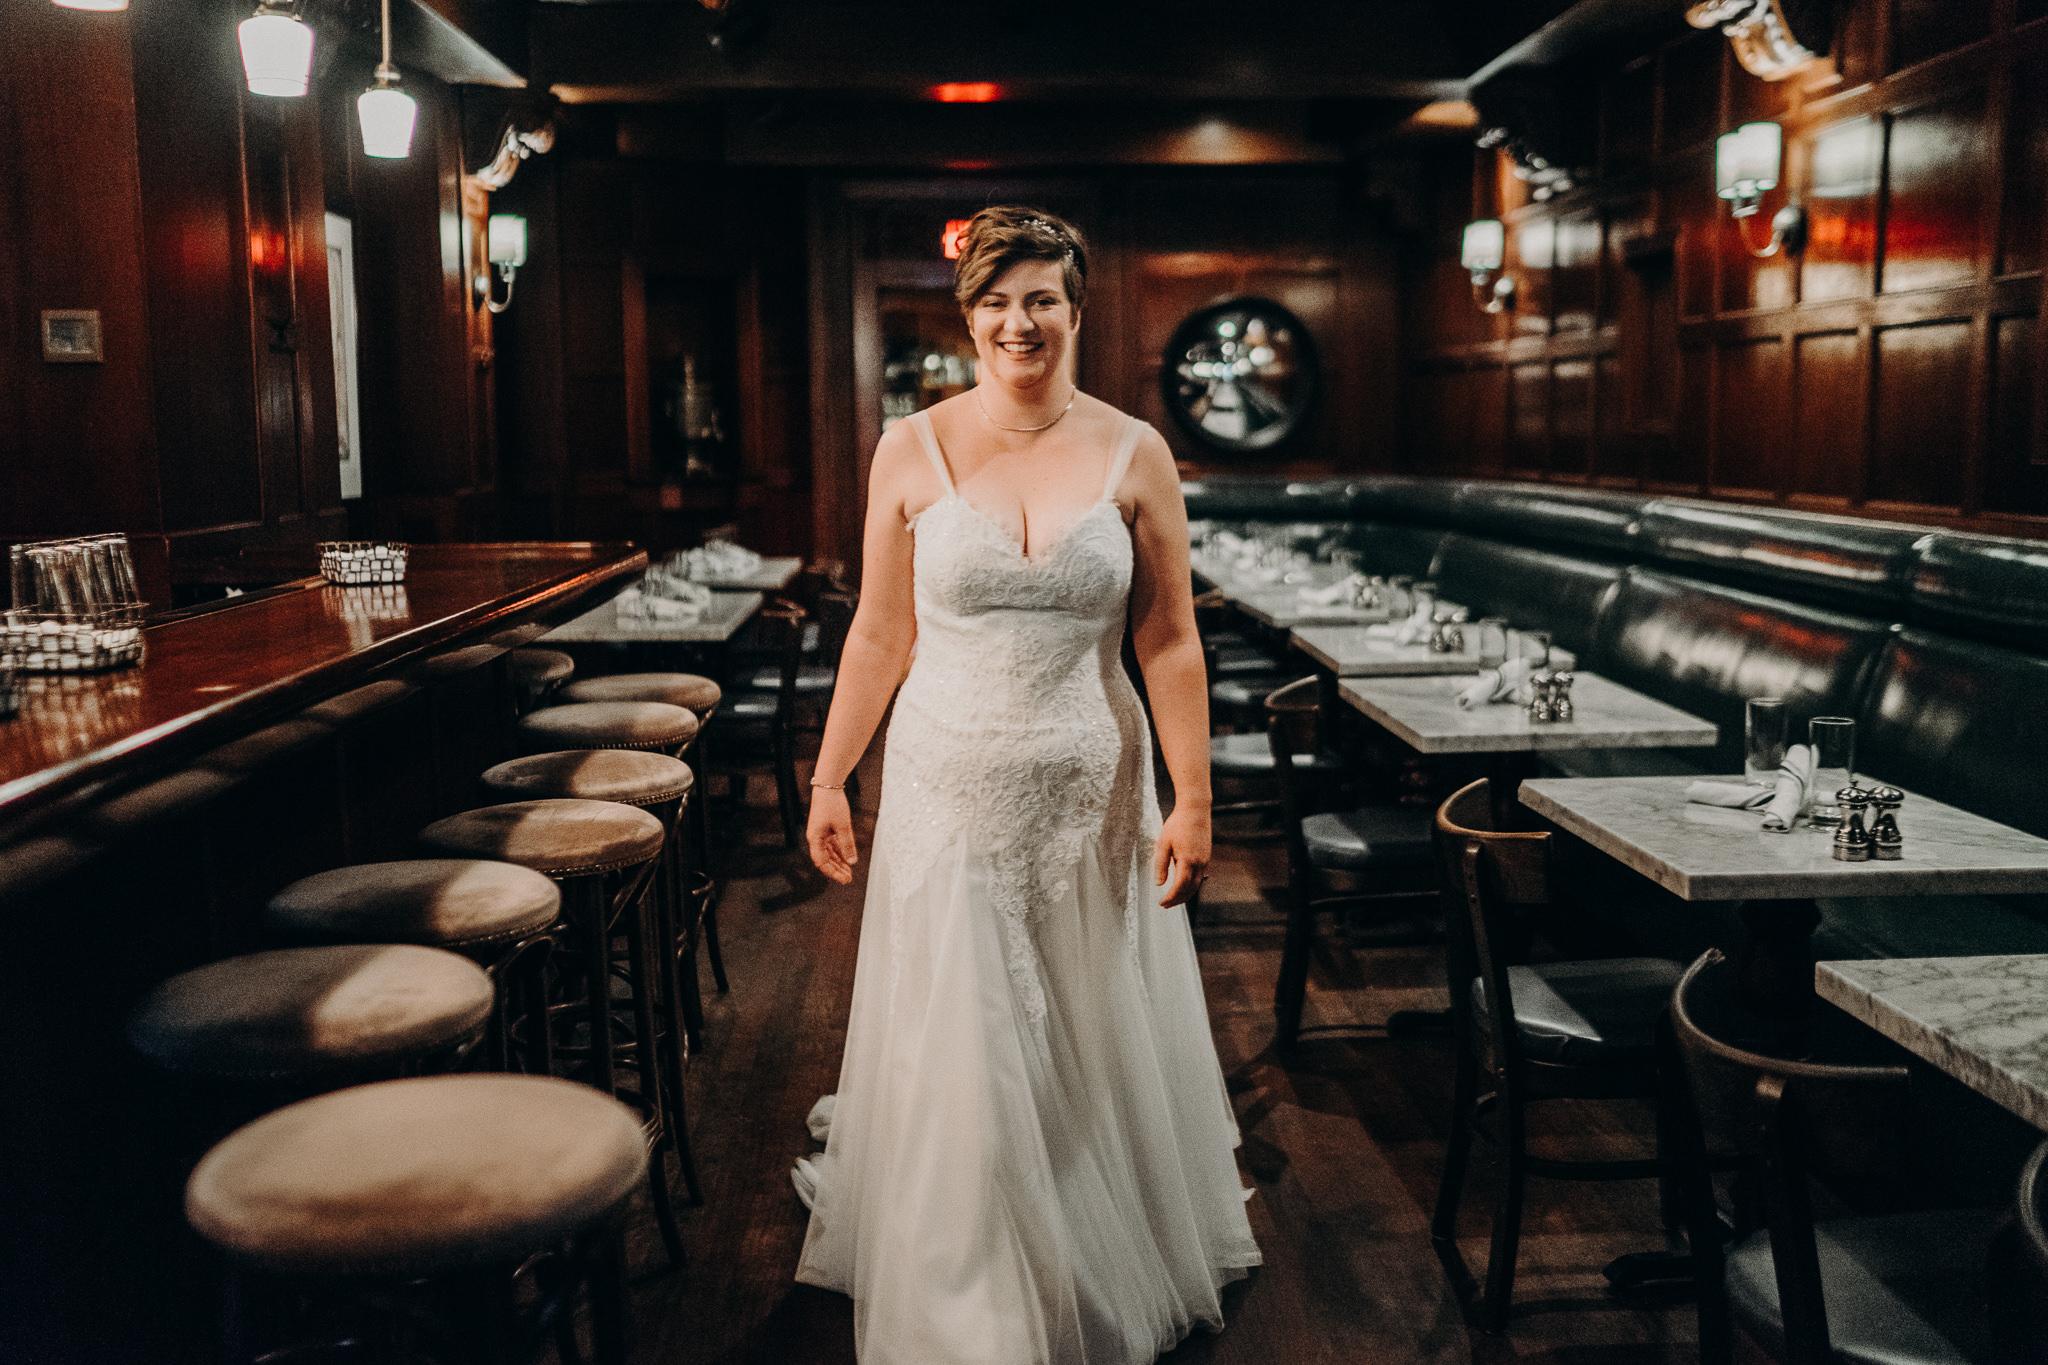 Sorrento Seattle dark bar bride dress alfred tang